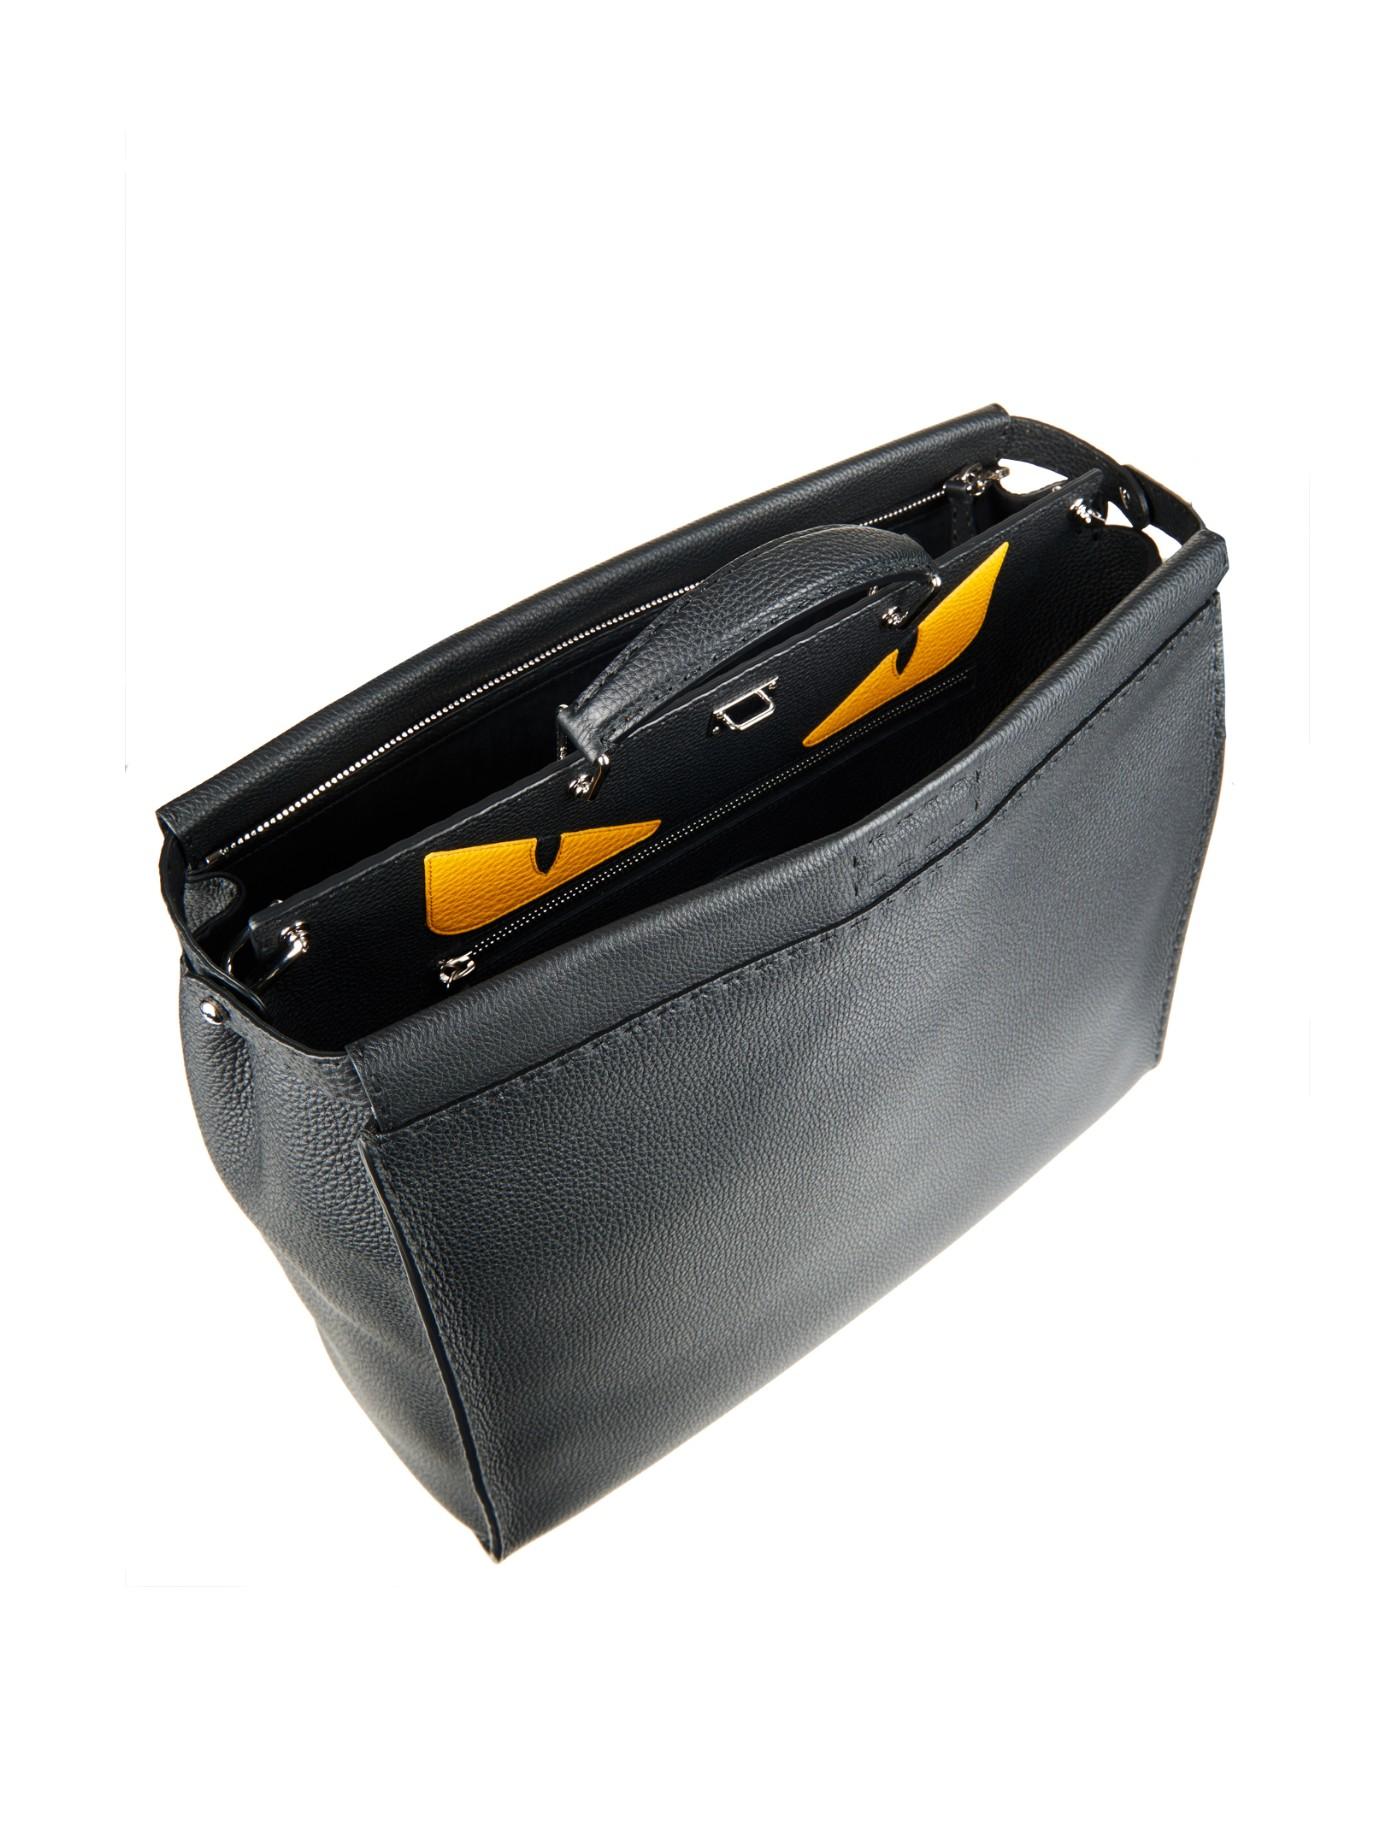 Lyst - Fendi Selleria Peekaboo Leather Tote in Black for Men ac07ddb562bd5